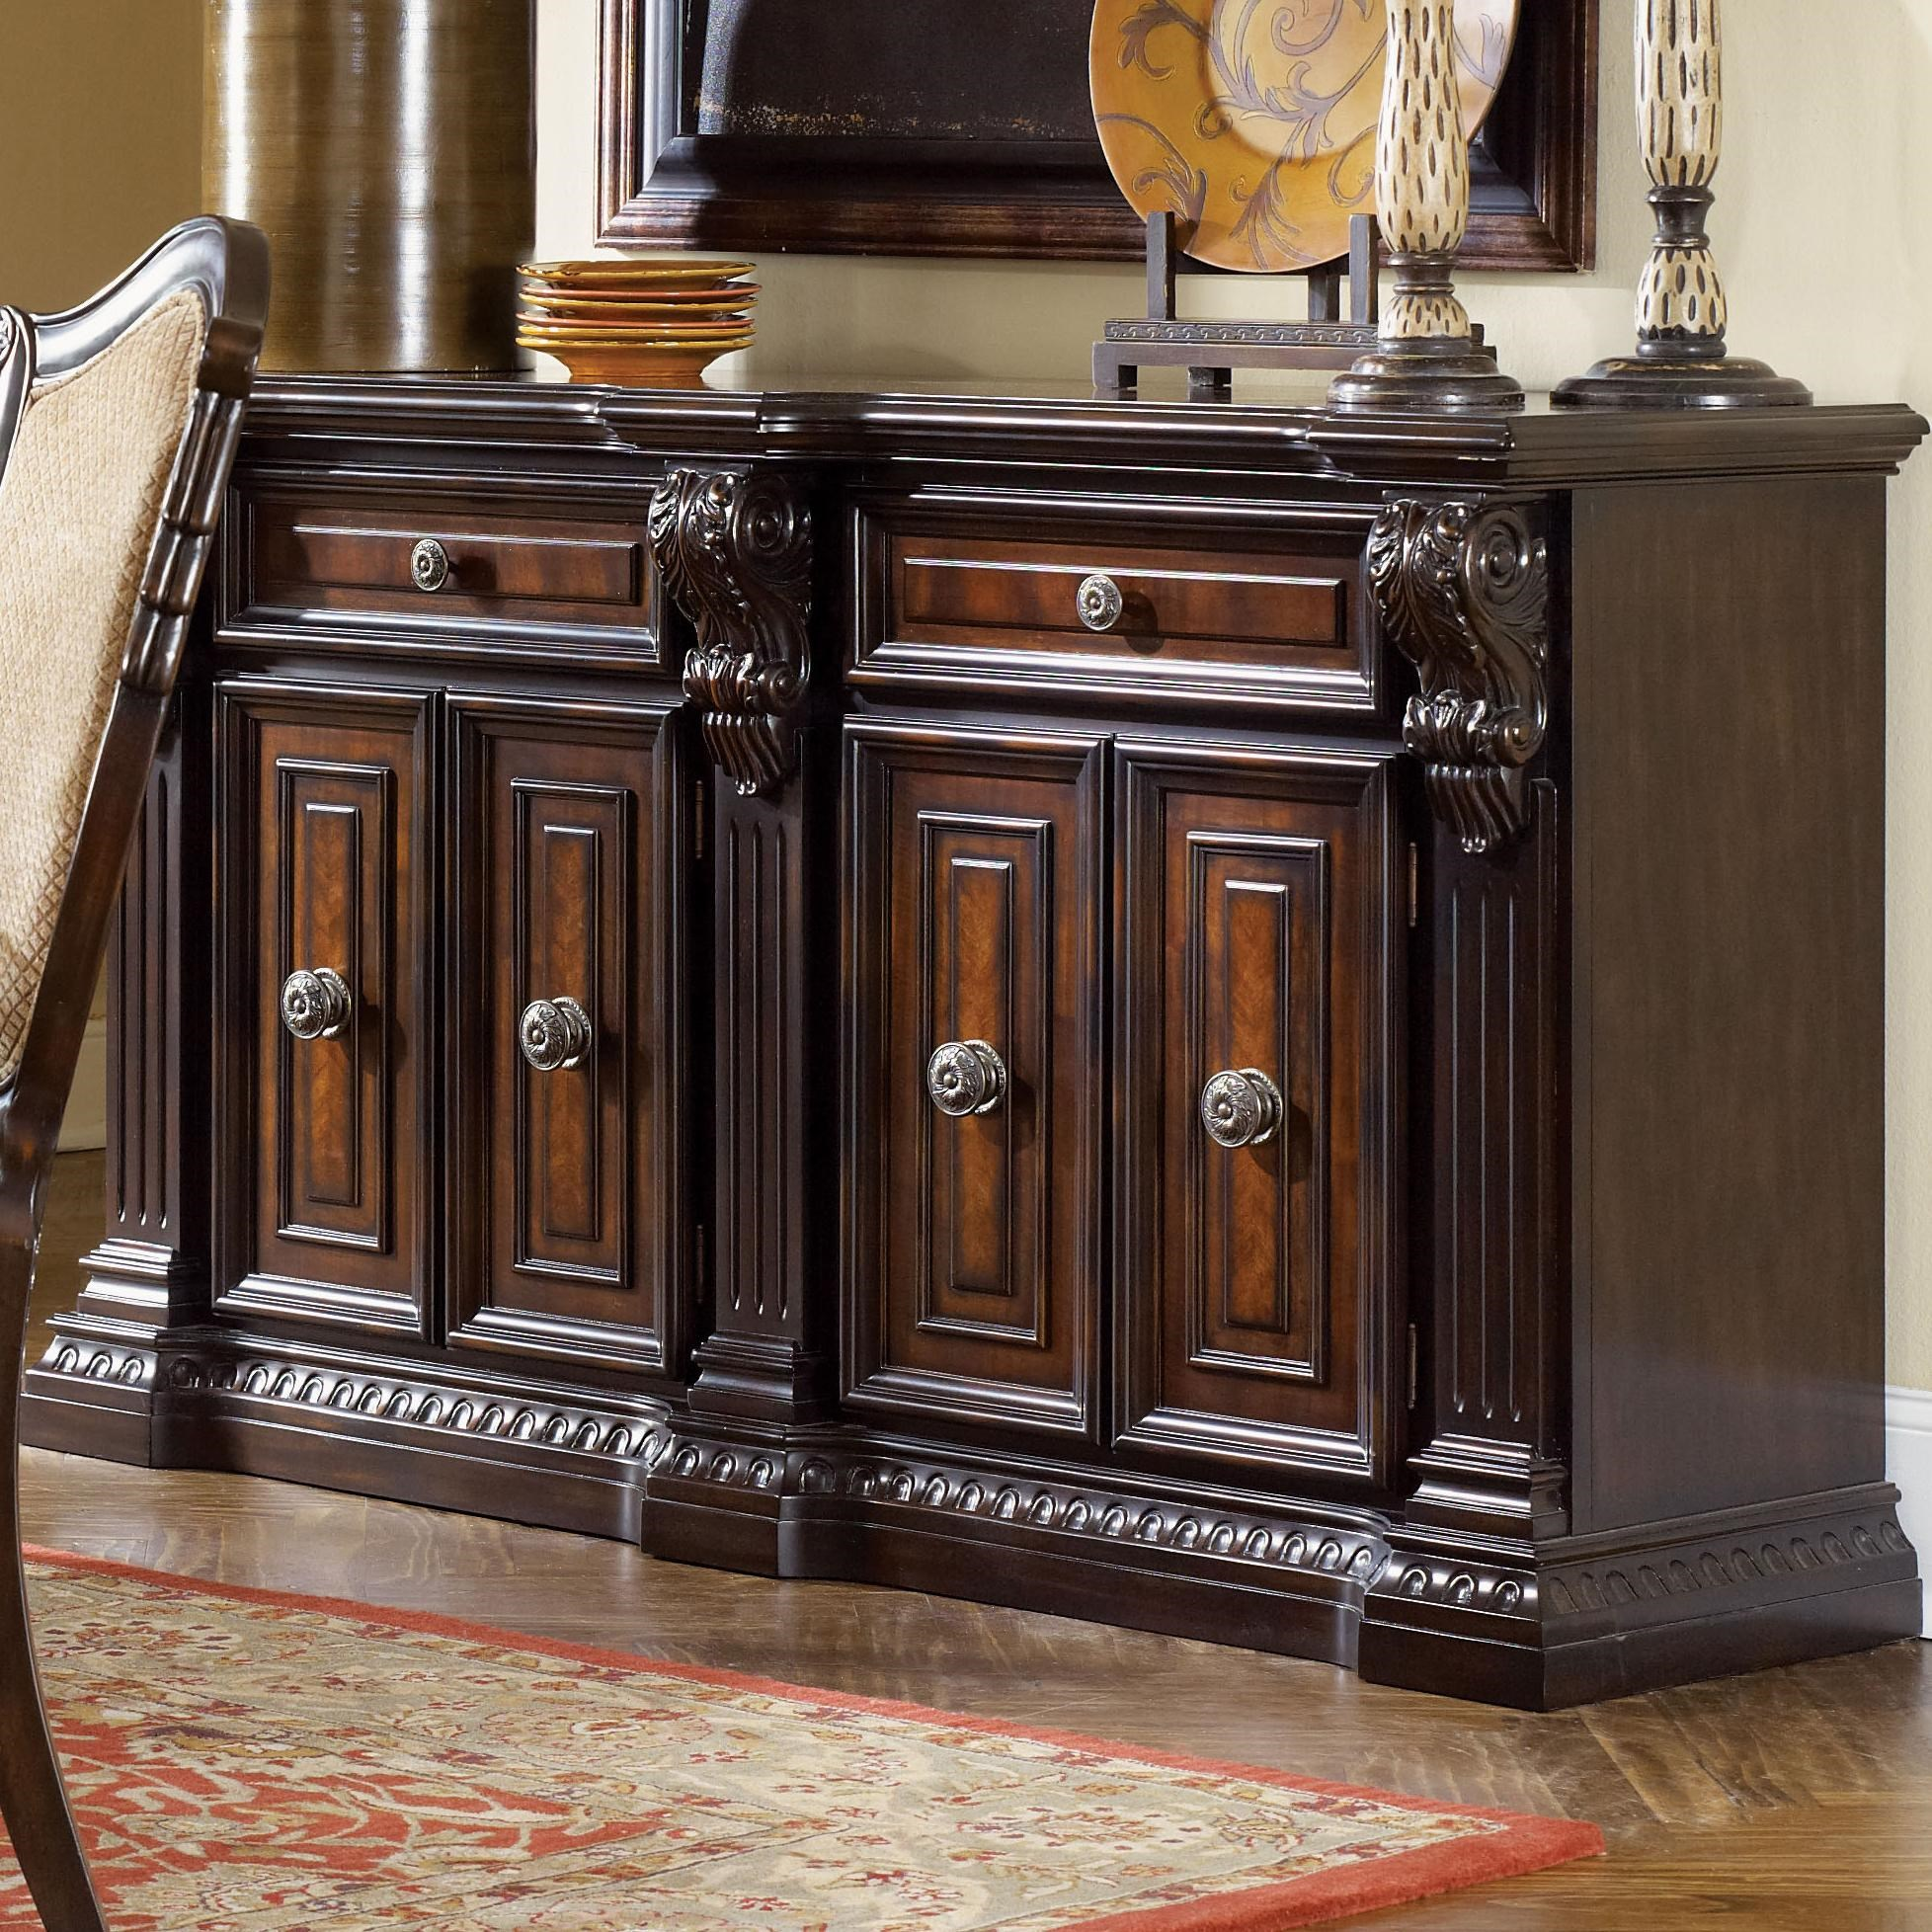 Fairmont Designs Grand Estates Sideboard Royal Furniture